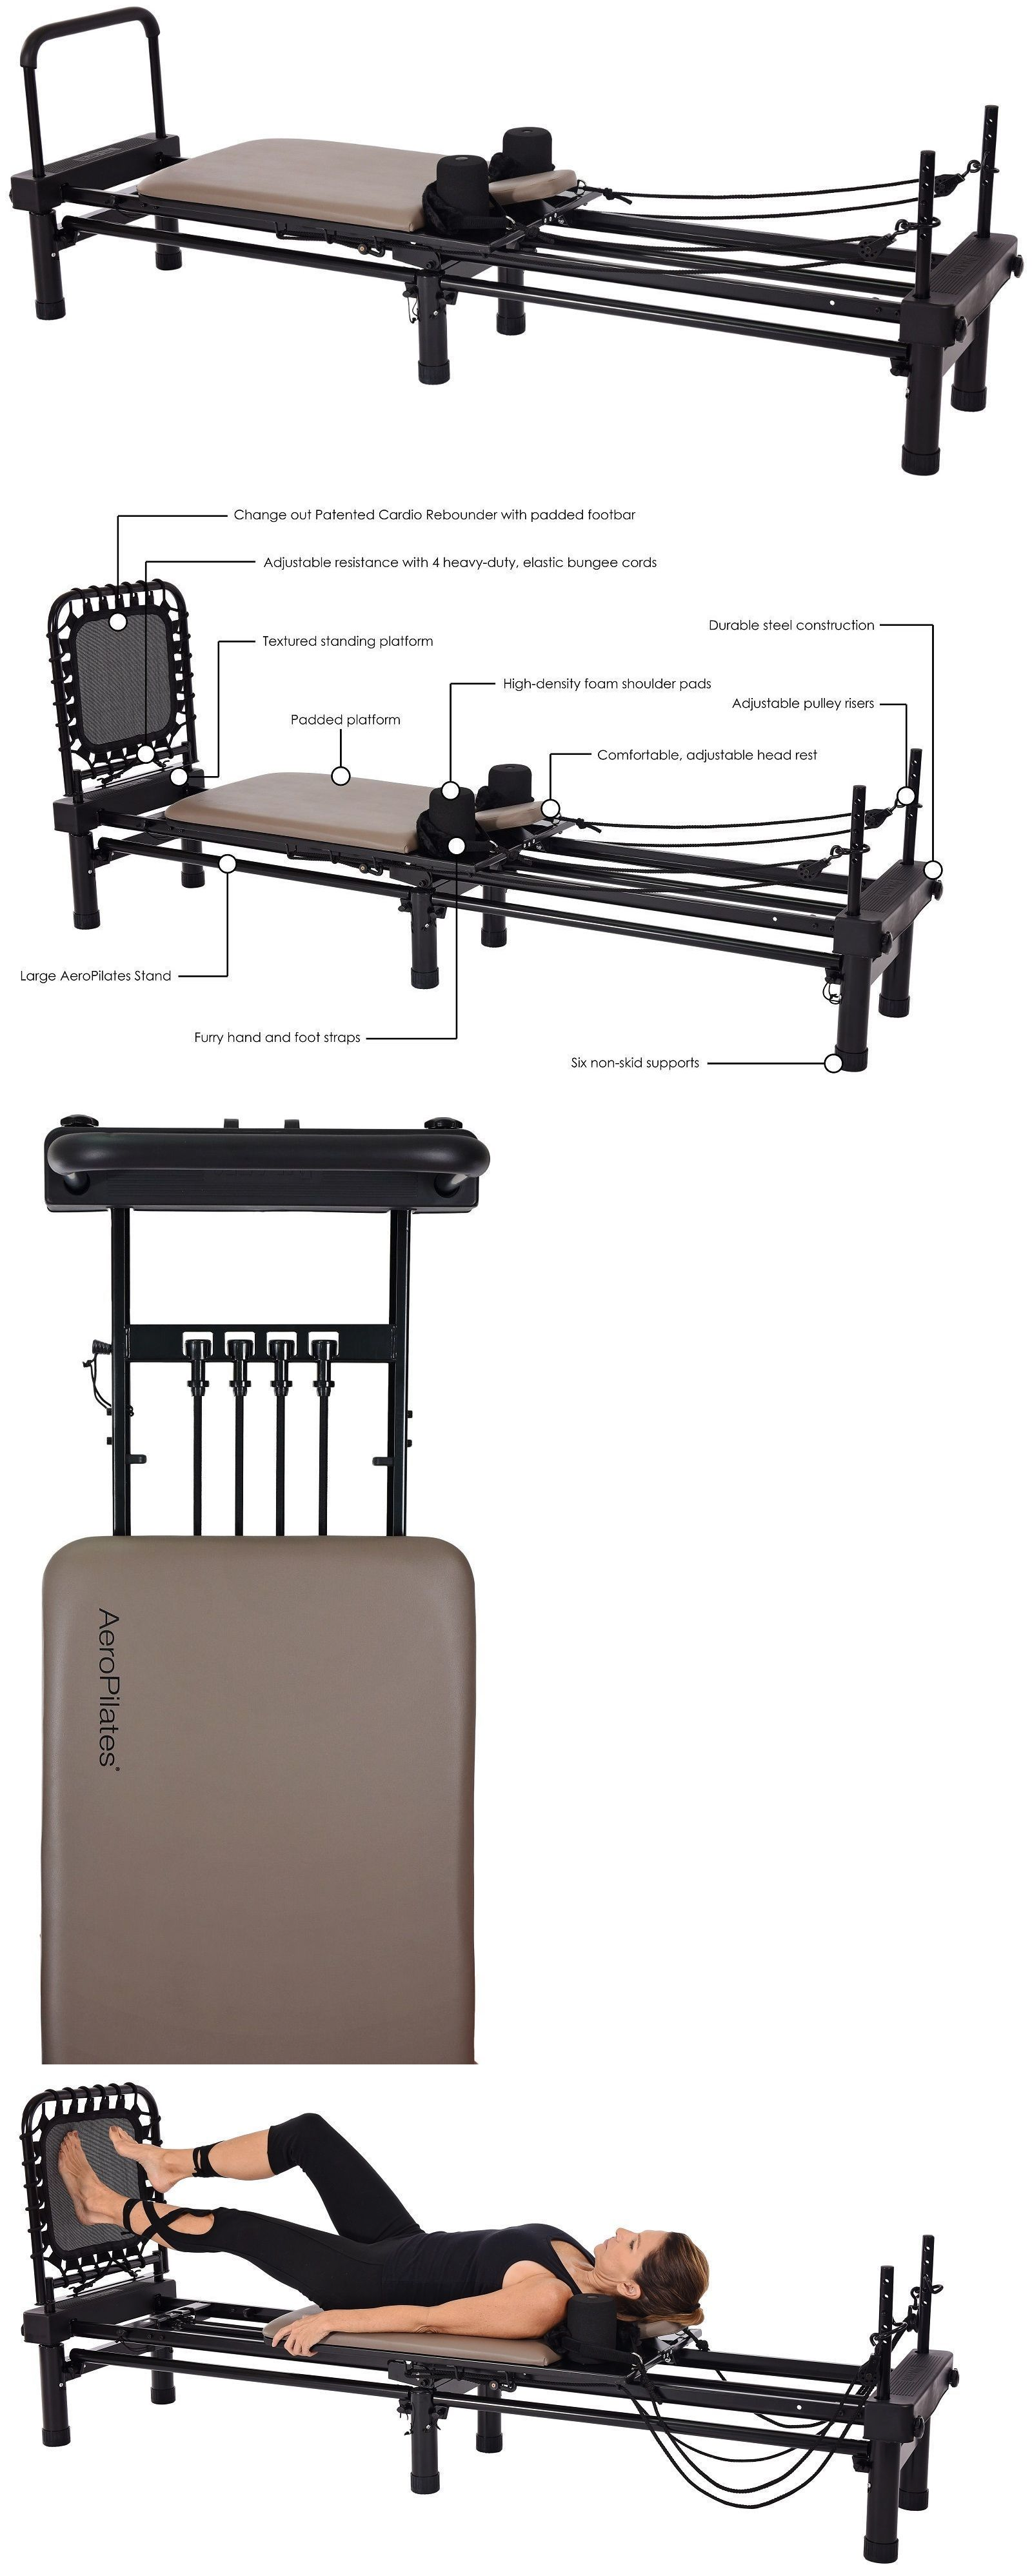 Pilates malibu chair buy malibu chair pilates combo - Pilates Tables 179807 Stamina Aeropilates Reformer 651 Pilates Exercise With Stand And Cardio Rebounder